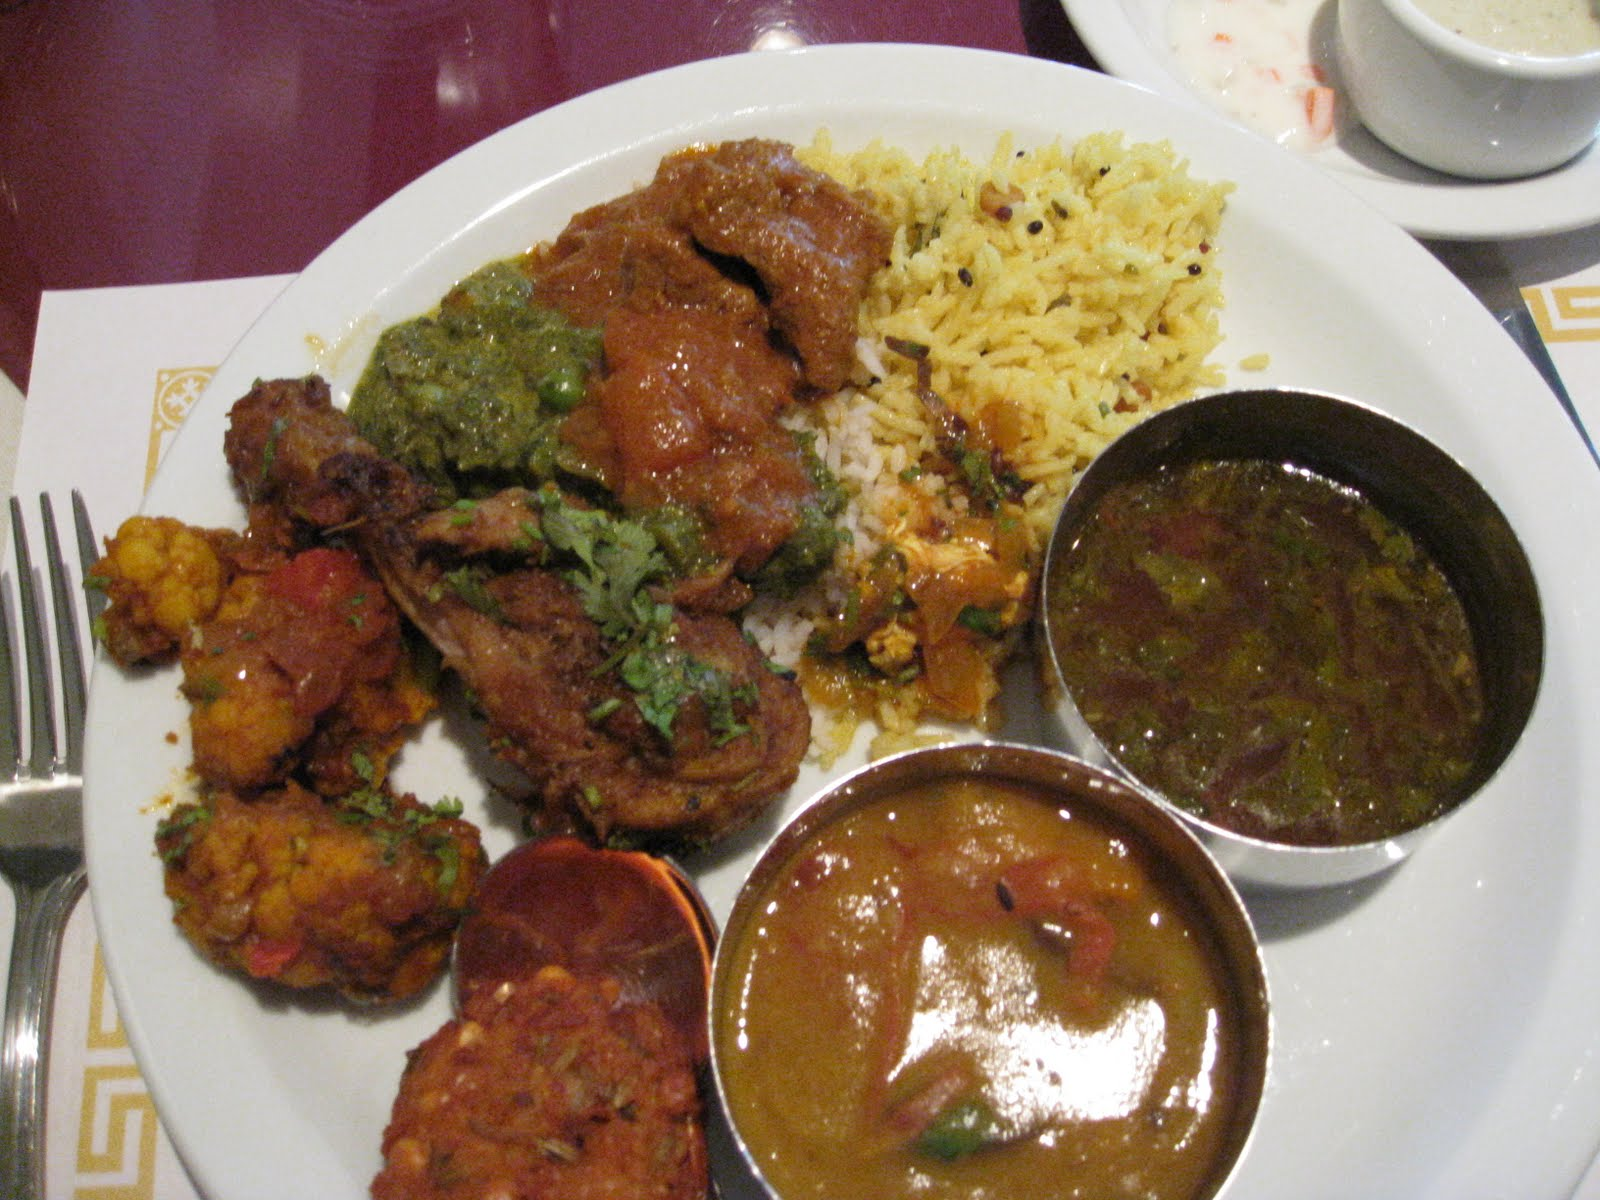 Sesame tea eats om south indian novato for Anokha cuisine of india novato